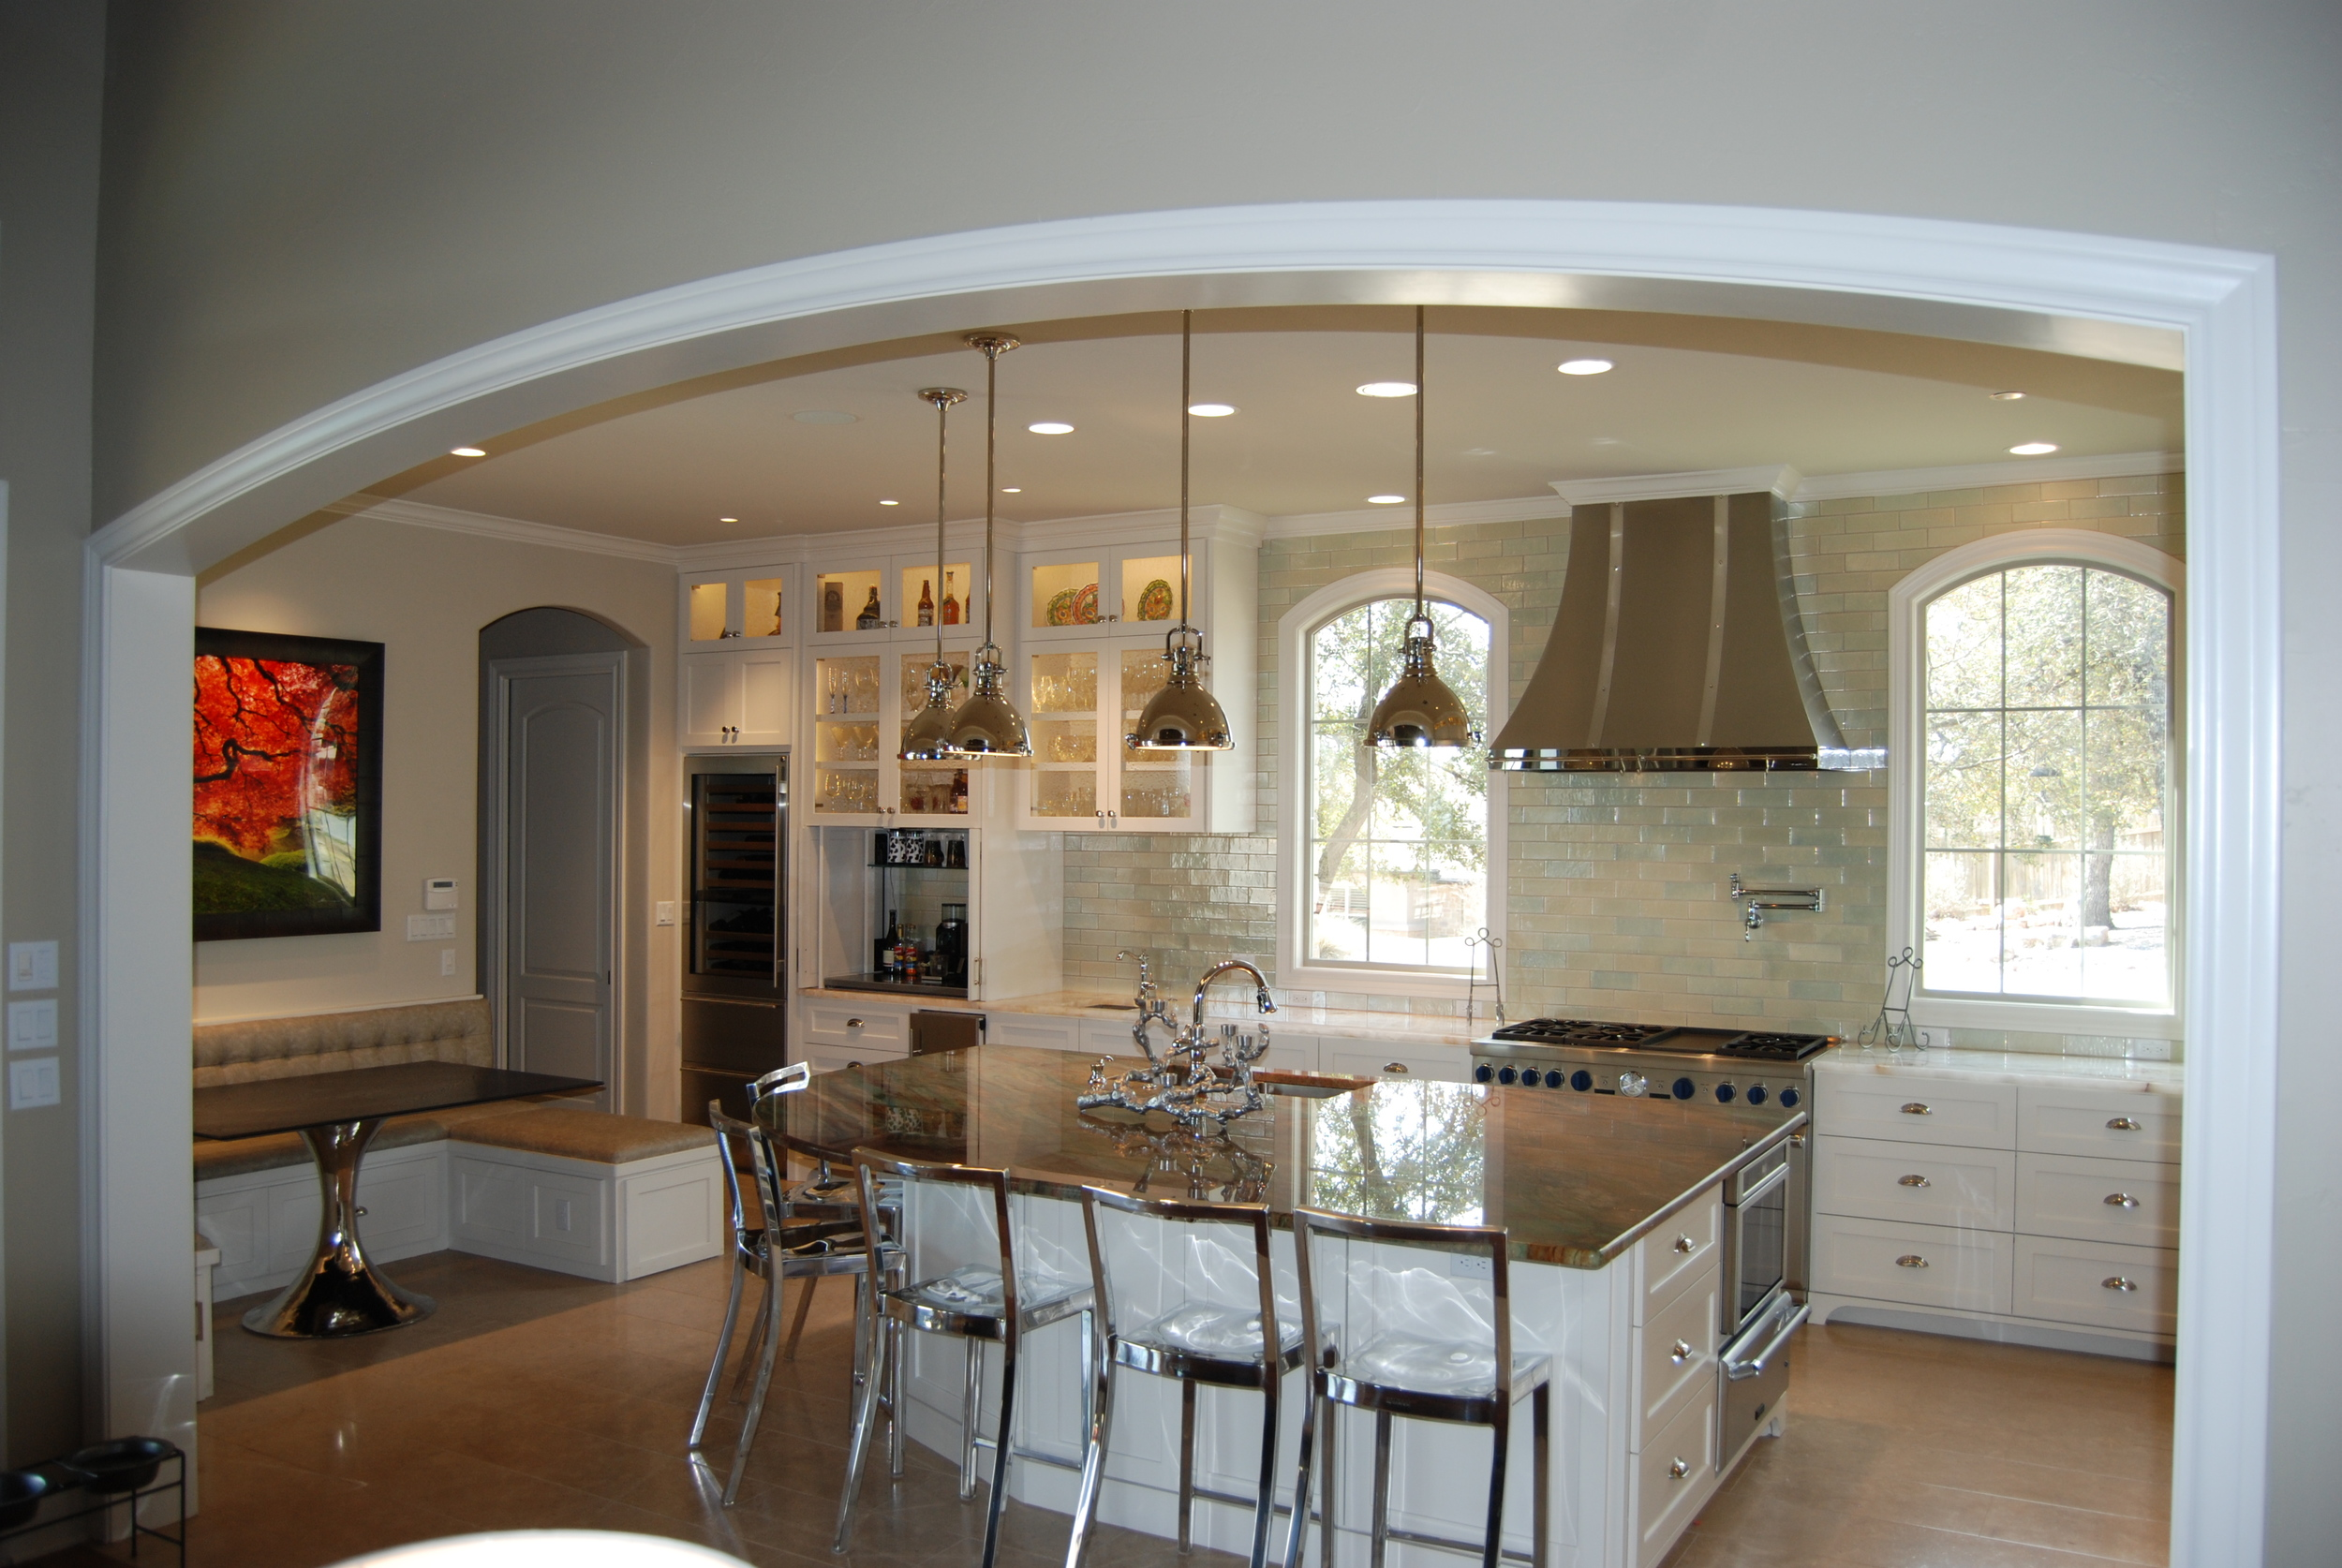 kitchens003.jpg